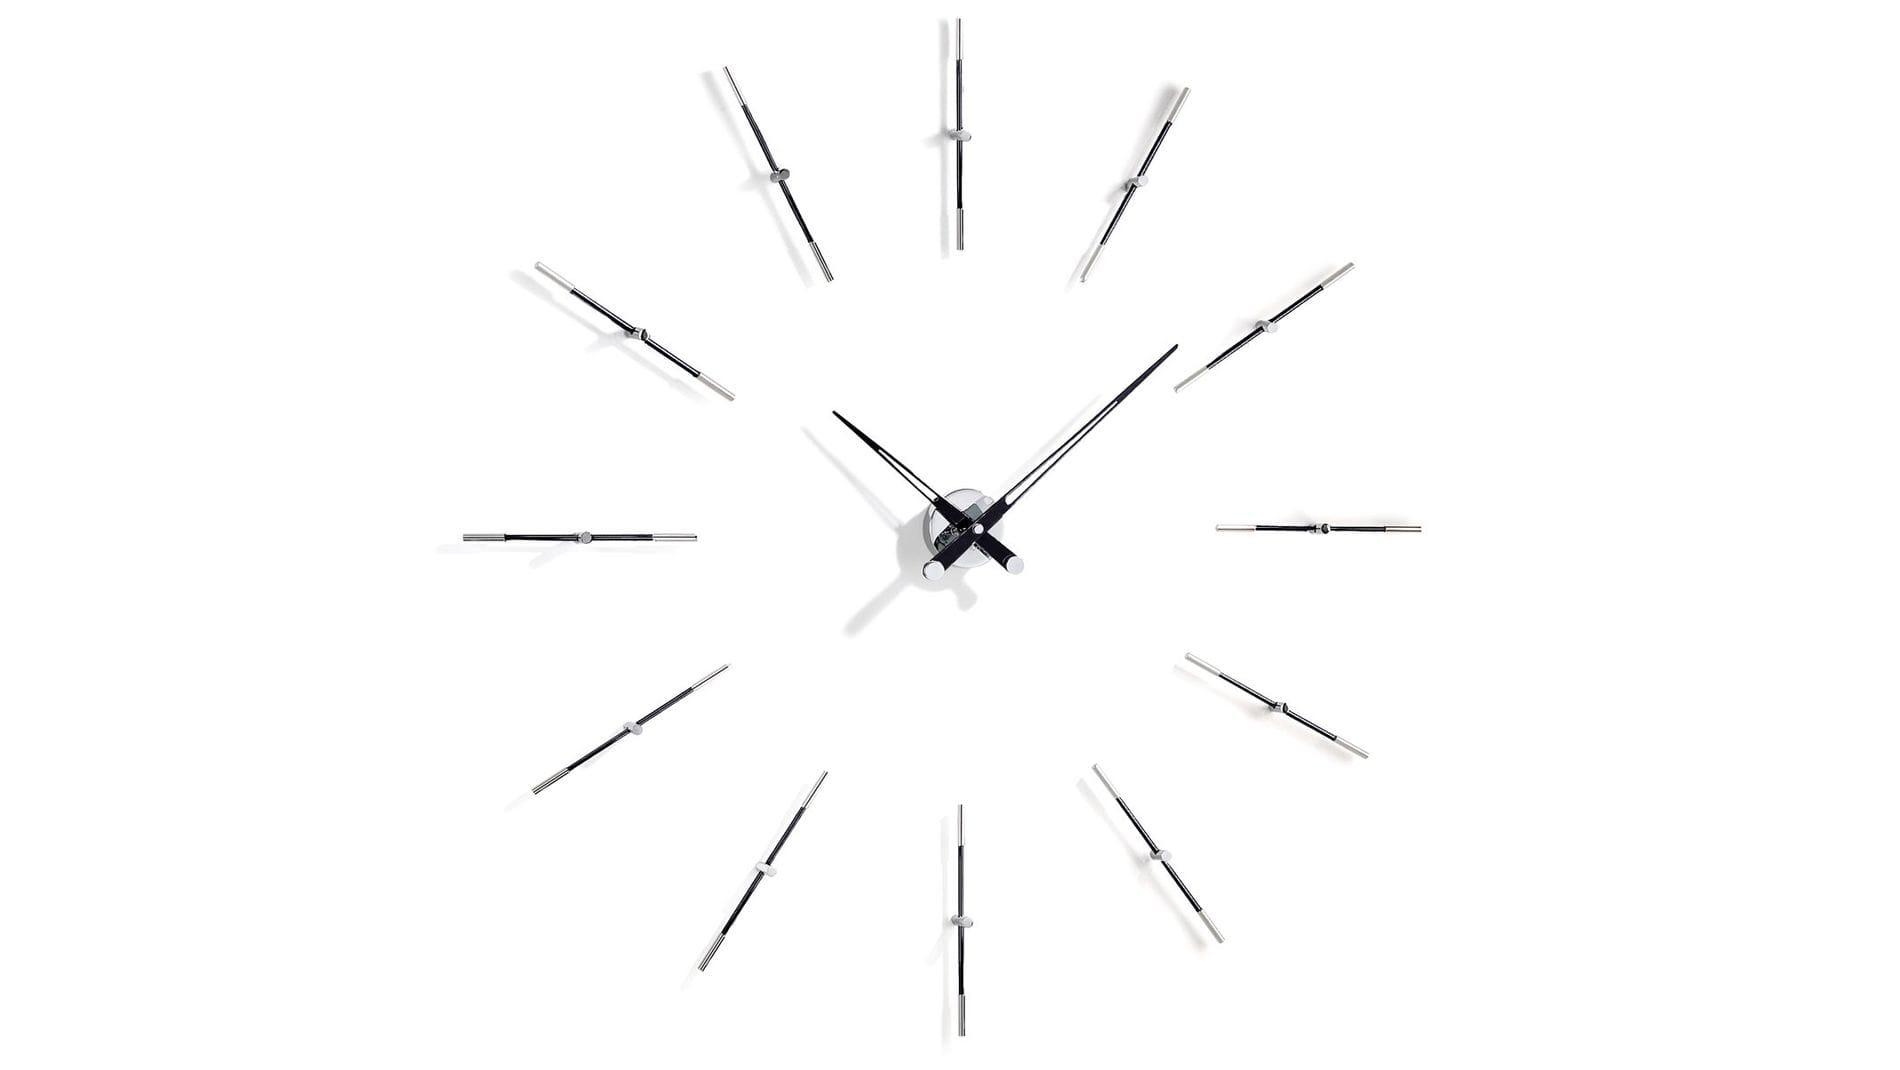 Merlin 12 i BLACK, Nomon(Испания), часы настенные, d=110cm, мех-м UTS